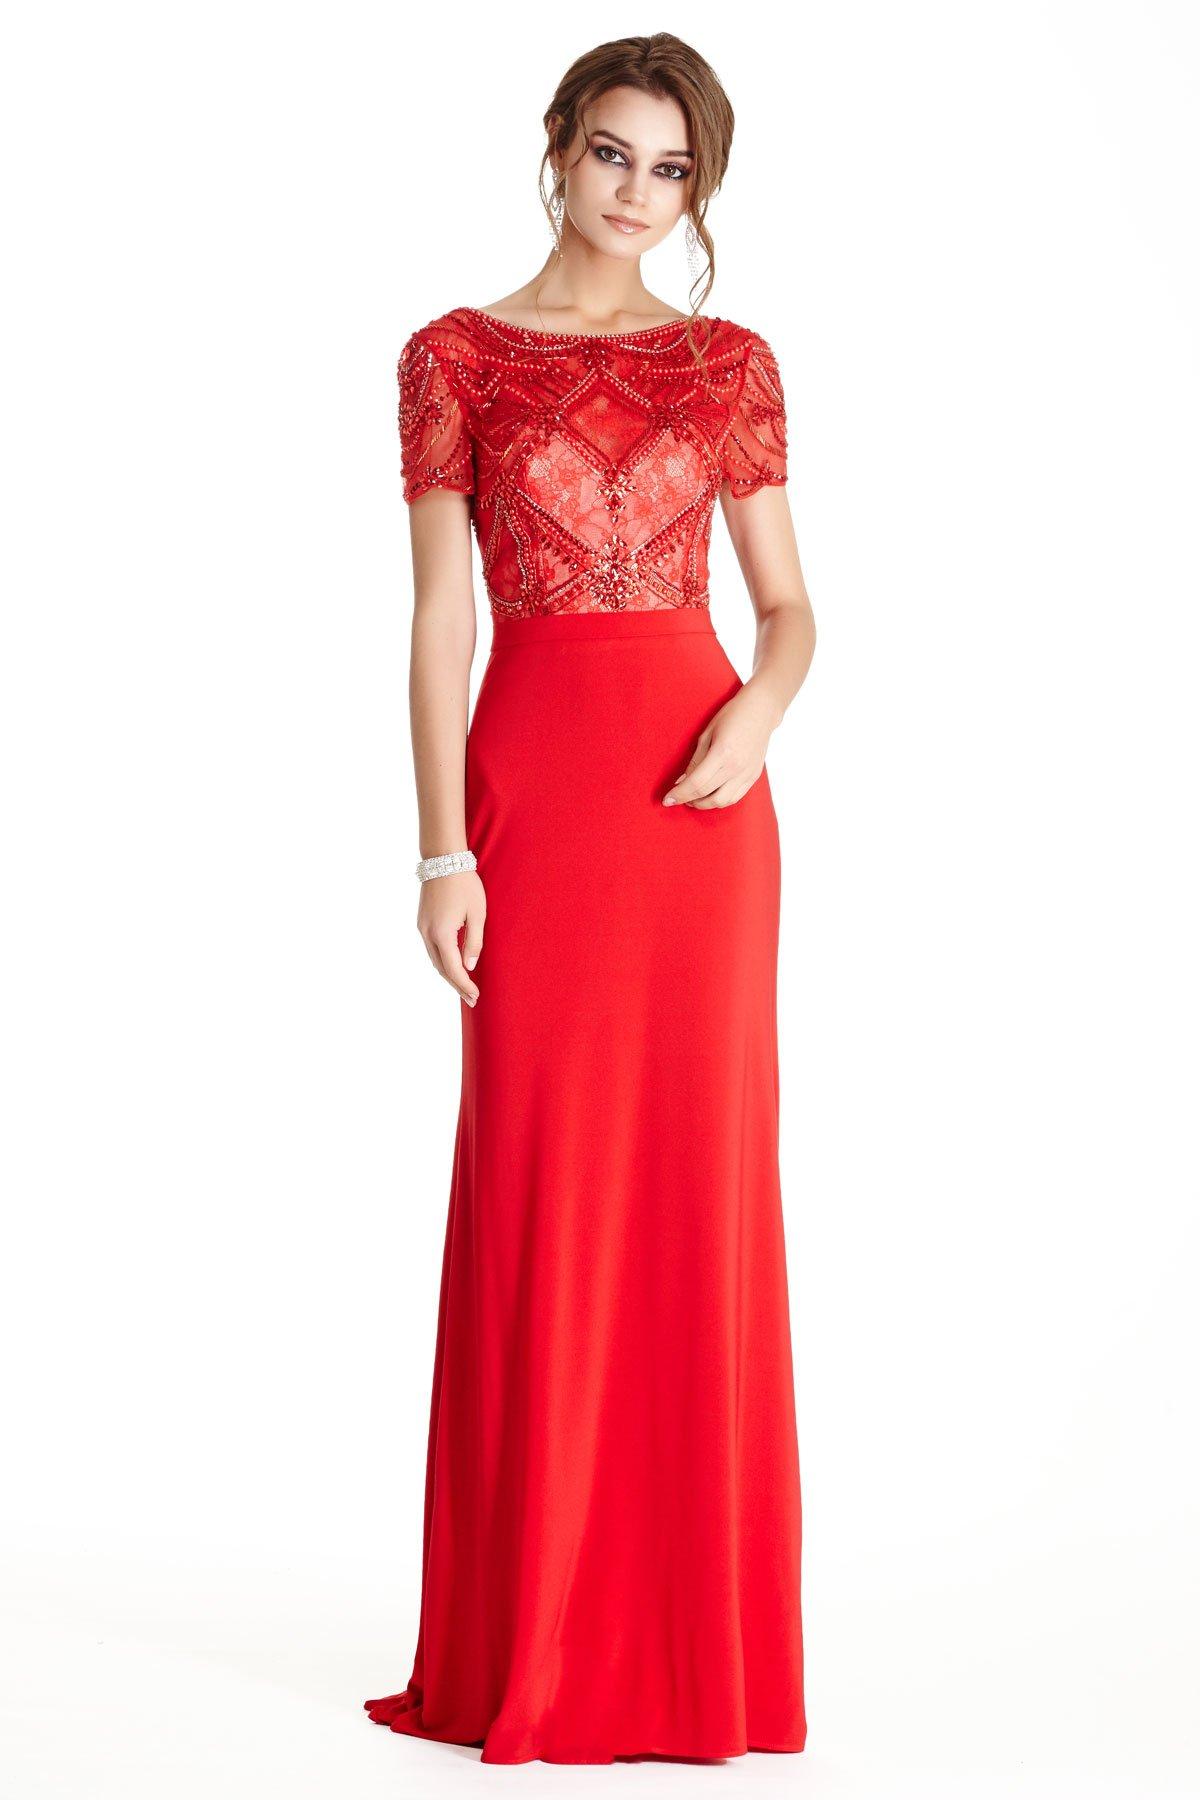 Gemstone Evening Dress